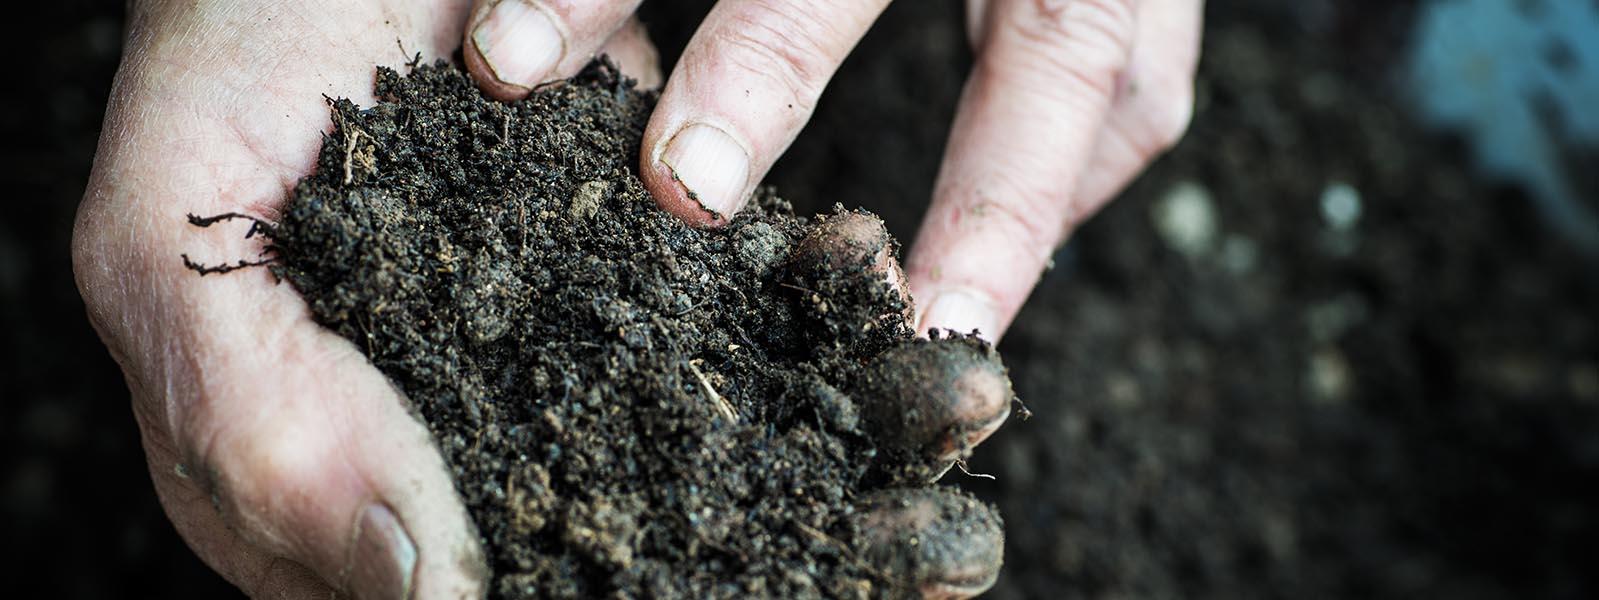 Farmer hands in the earth